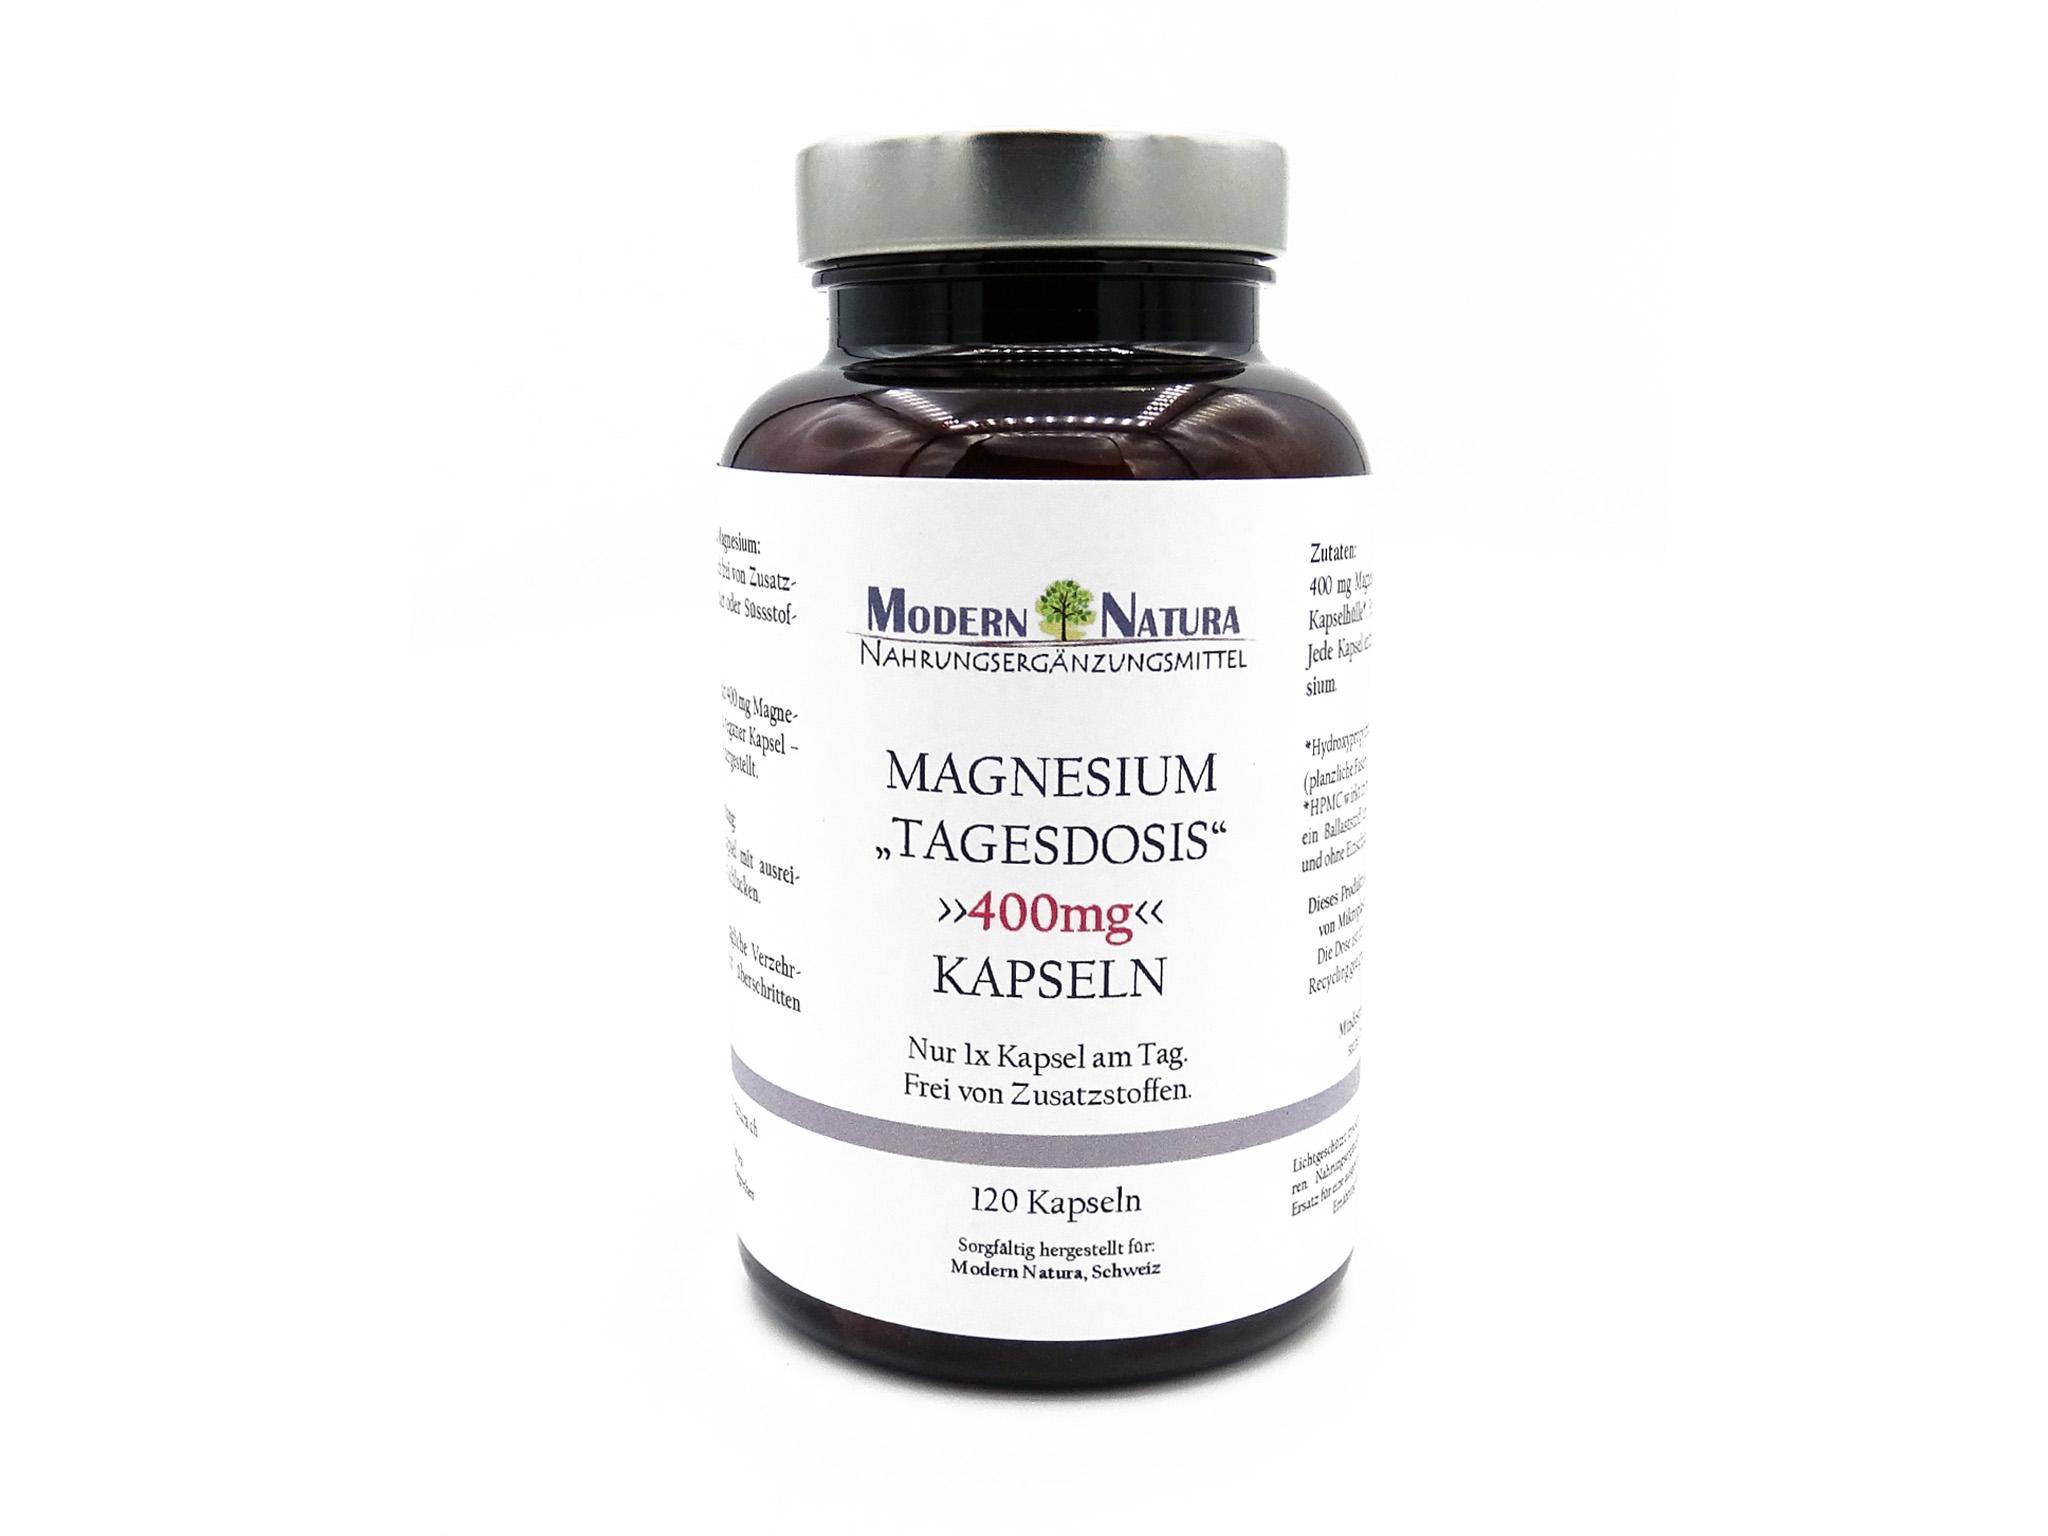 Magnesium - 400mg Tagesdosis Kapseln - Vegan & Glutenfrei